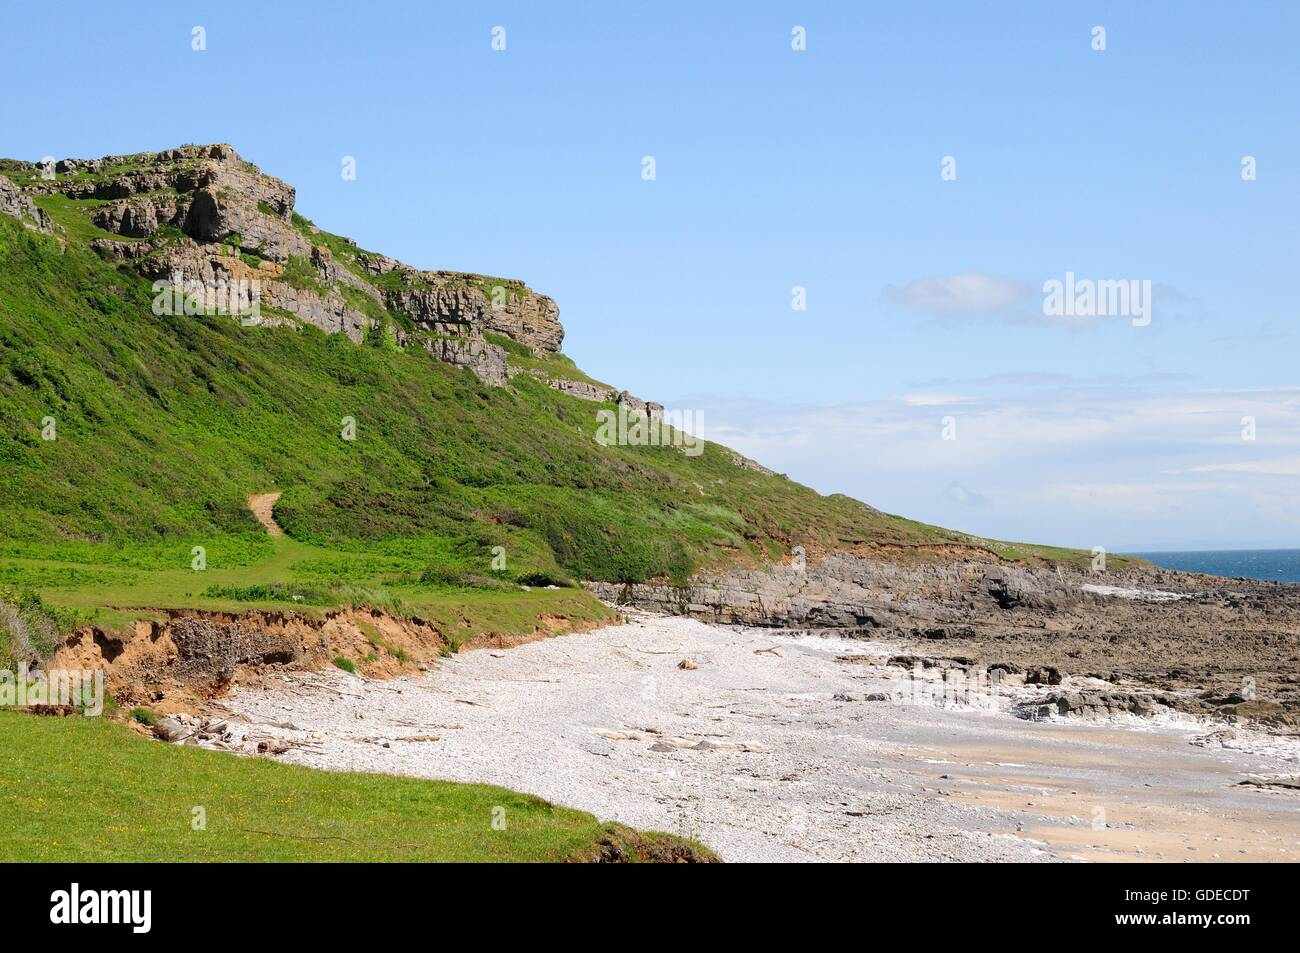 Coastal walk between Oxwich and Port Eynon gower peninsula Wales - Stock Image